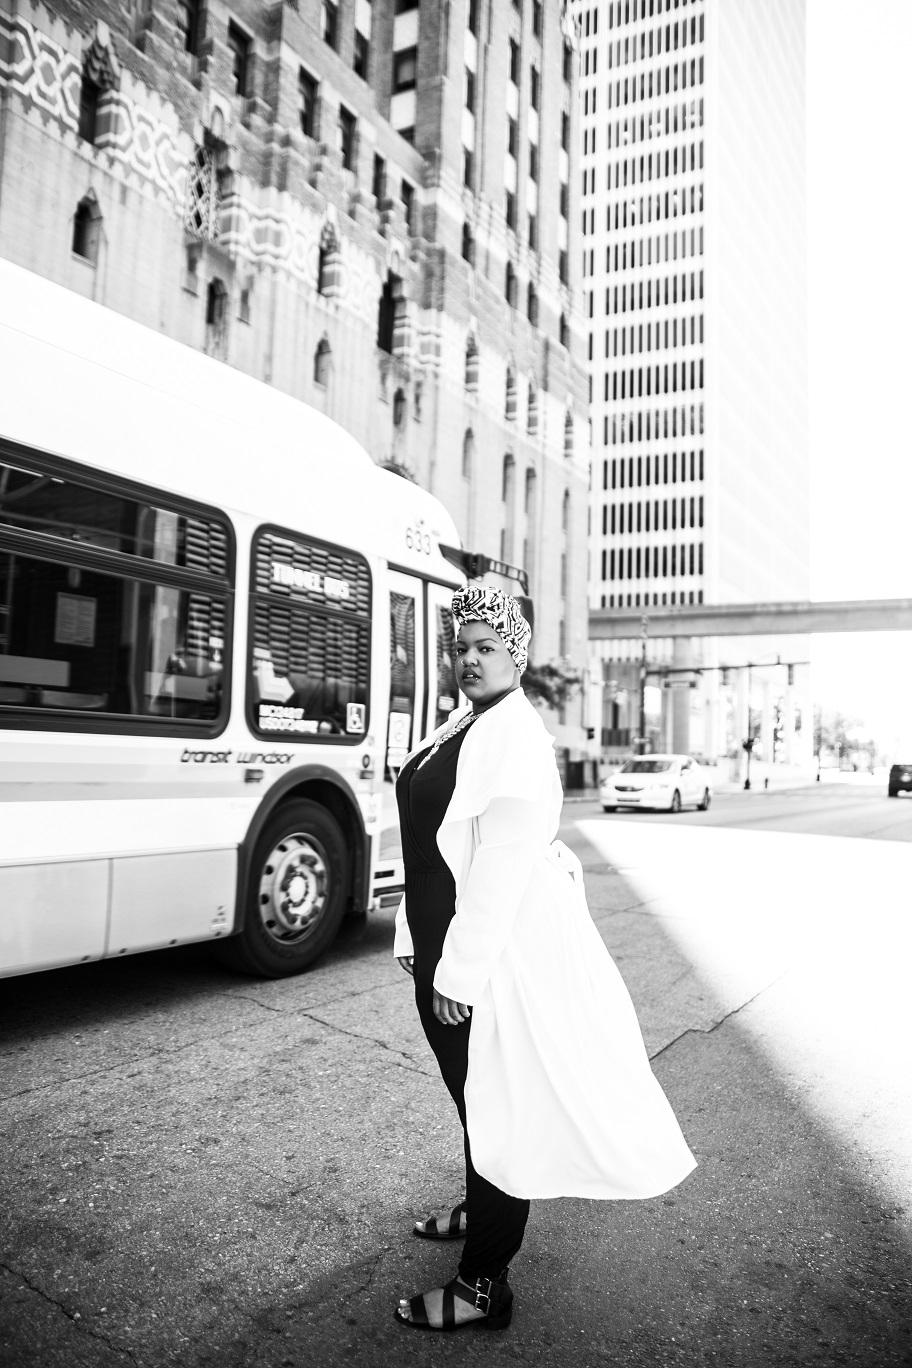 Plus-Size-Detroit-Style-Blogger-Street-Style-Body-Positive-Muslim-Girl-2